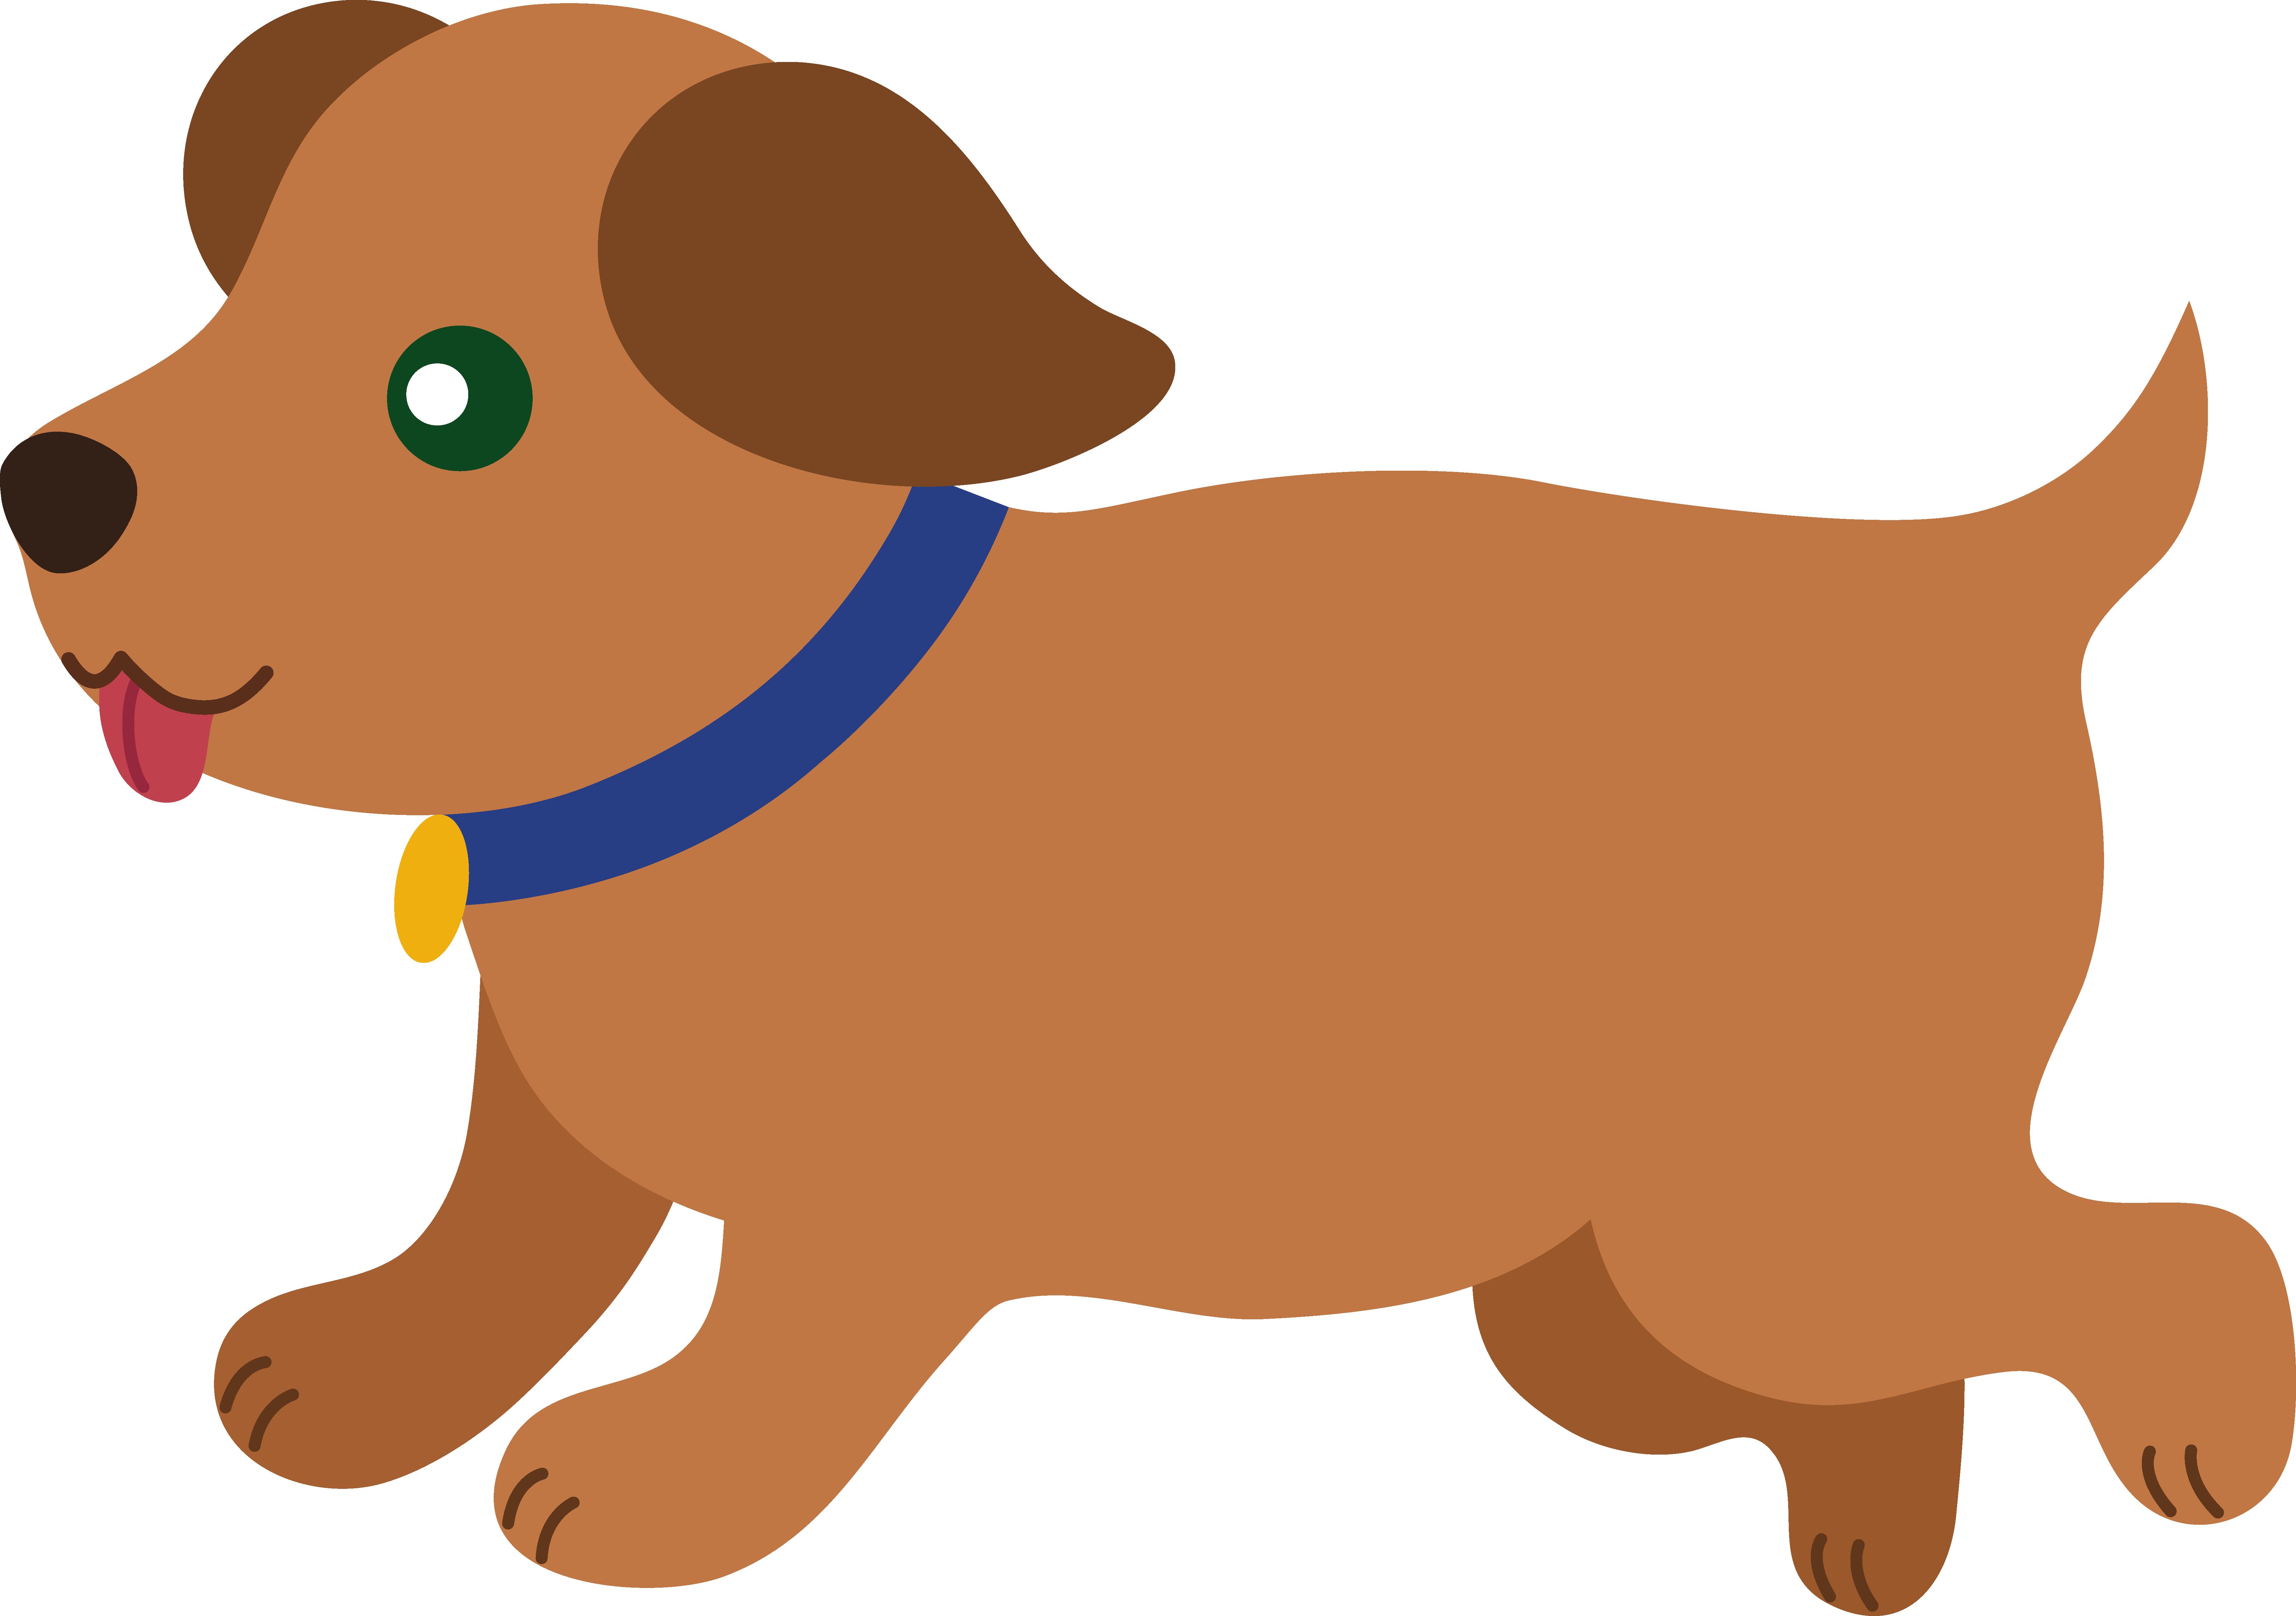 Animl clipart brown dog #7